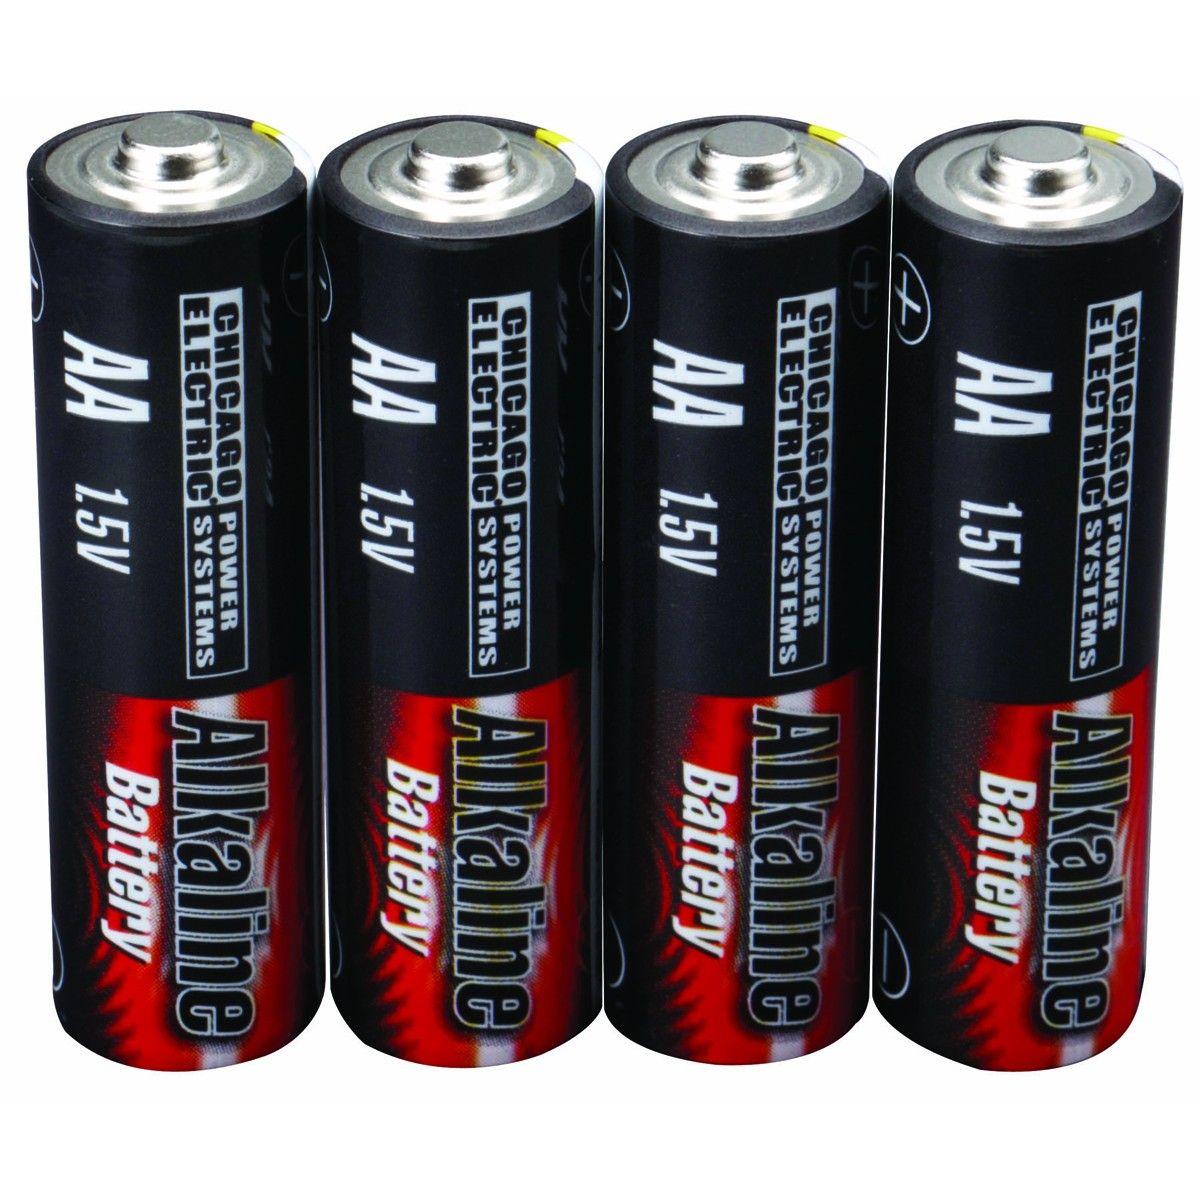 Aa Alkaline Batteries 4 Pk Alkaline Battery Alkaline Tv Remote Controls